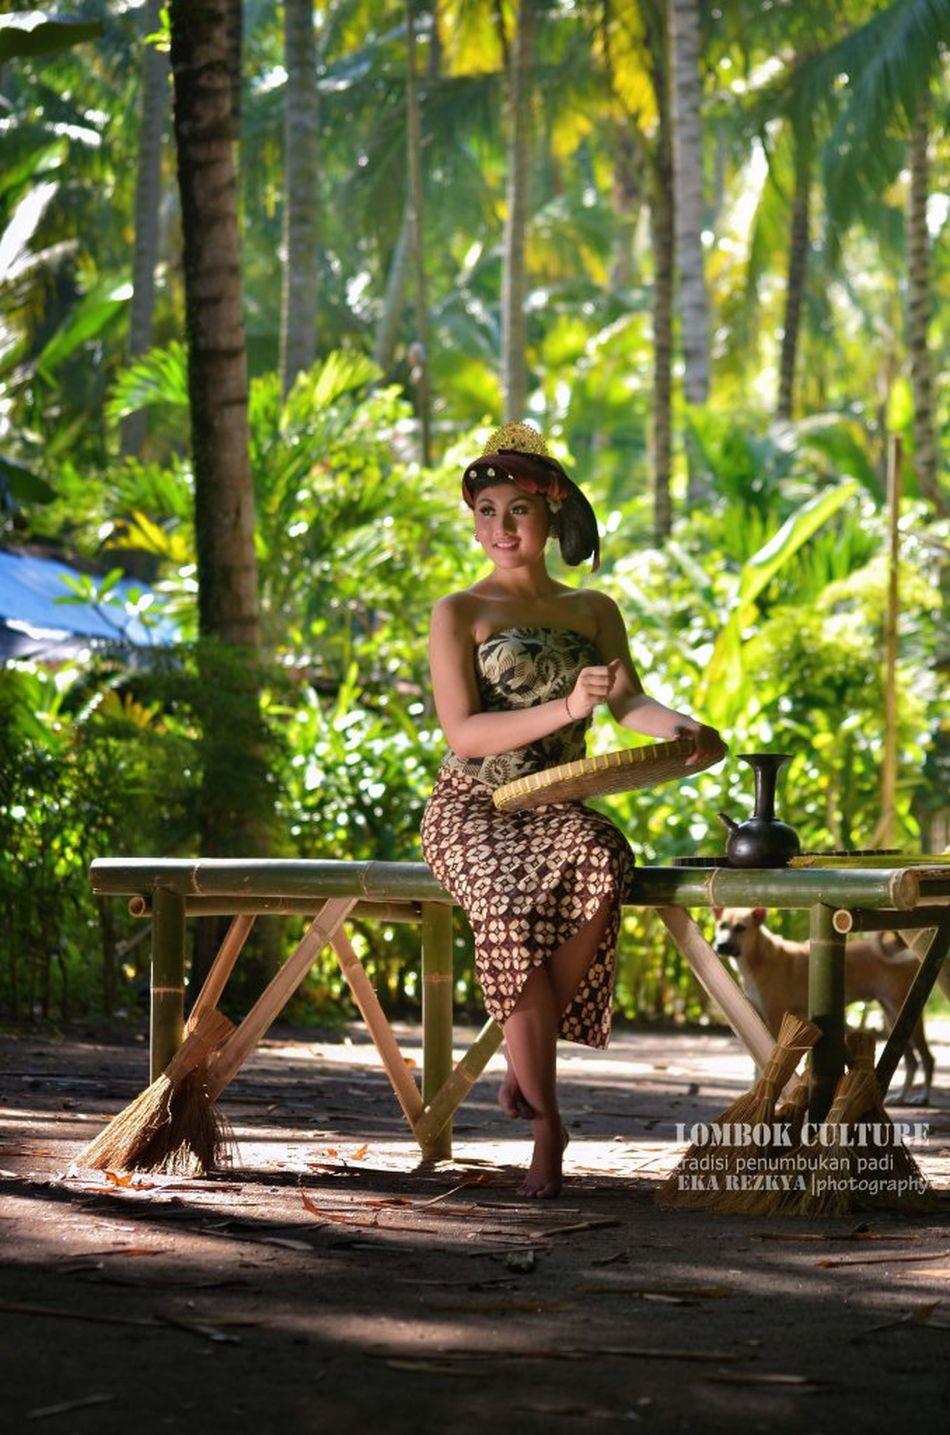 lombok culture, photography,